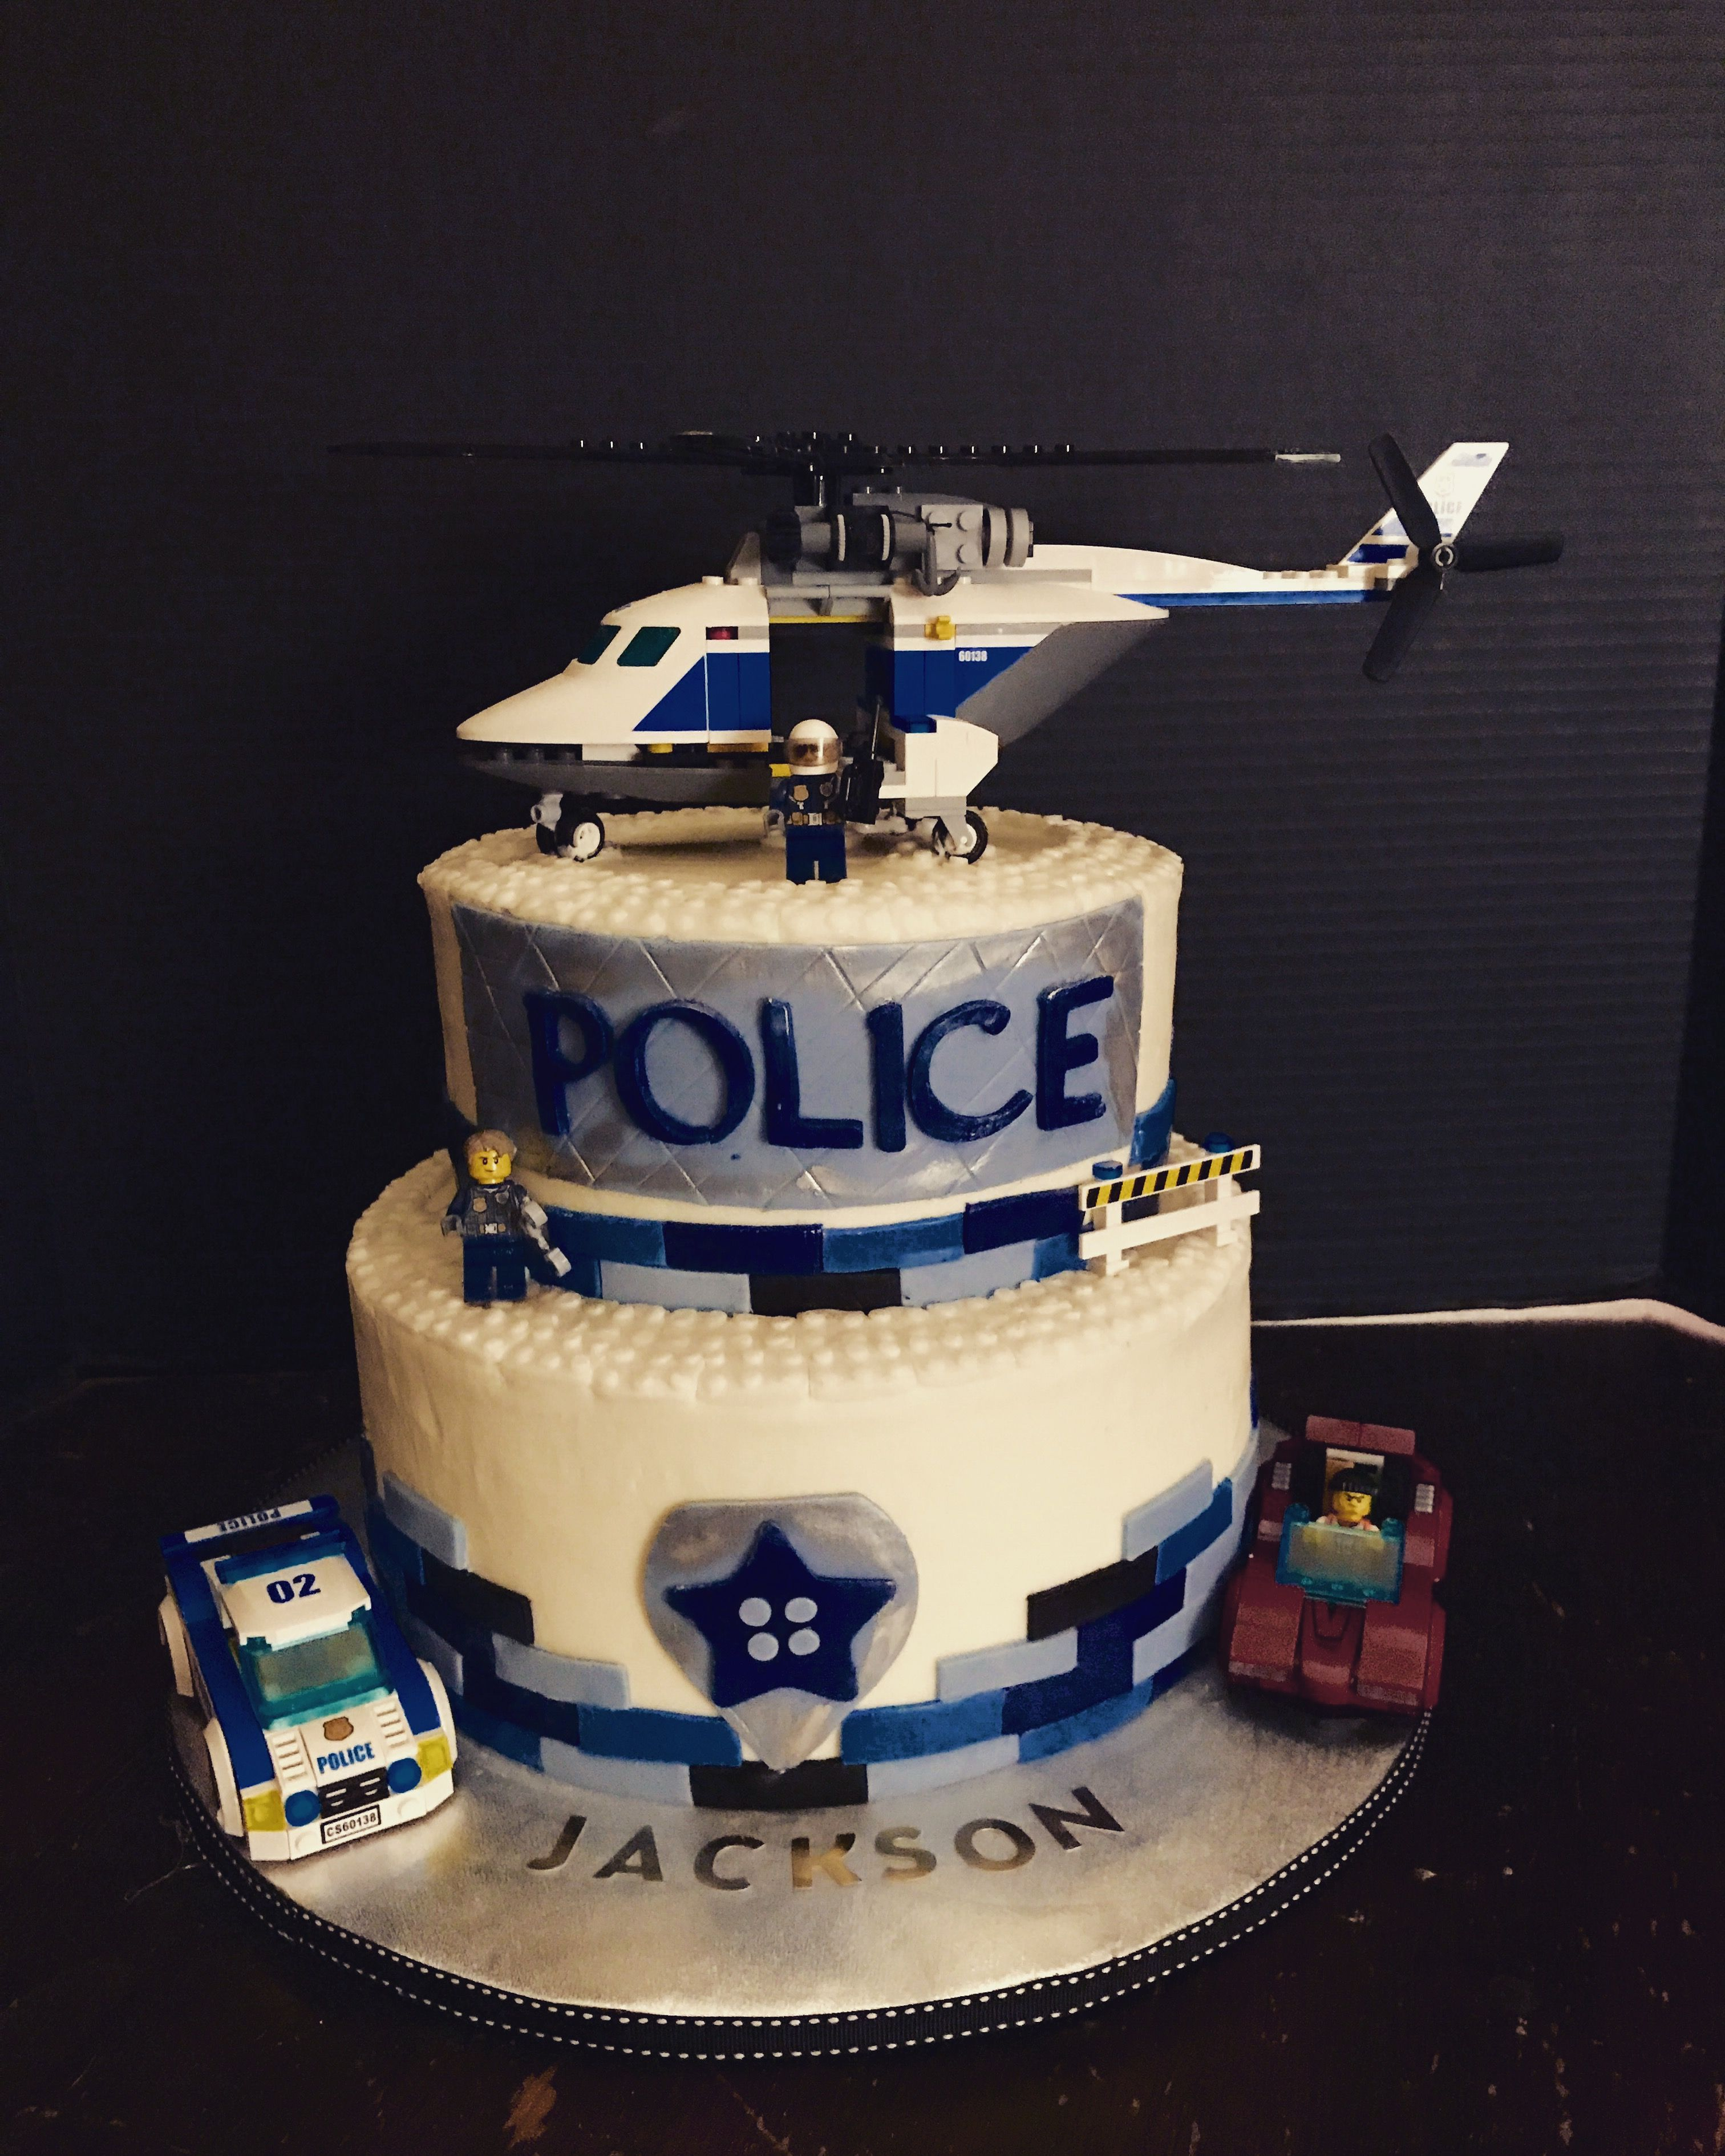 Lego Police Themed Happy Birthday Cake